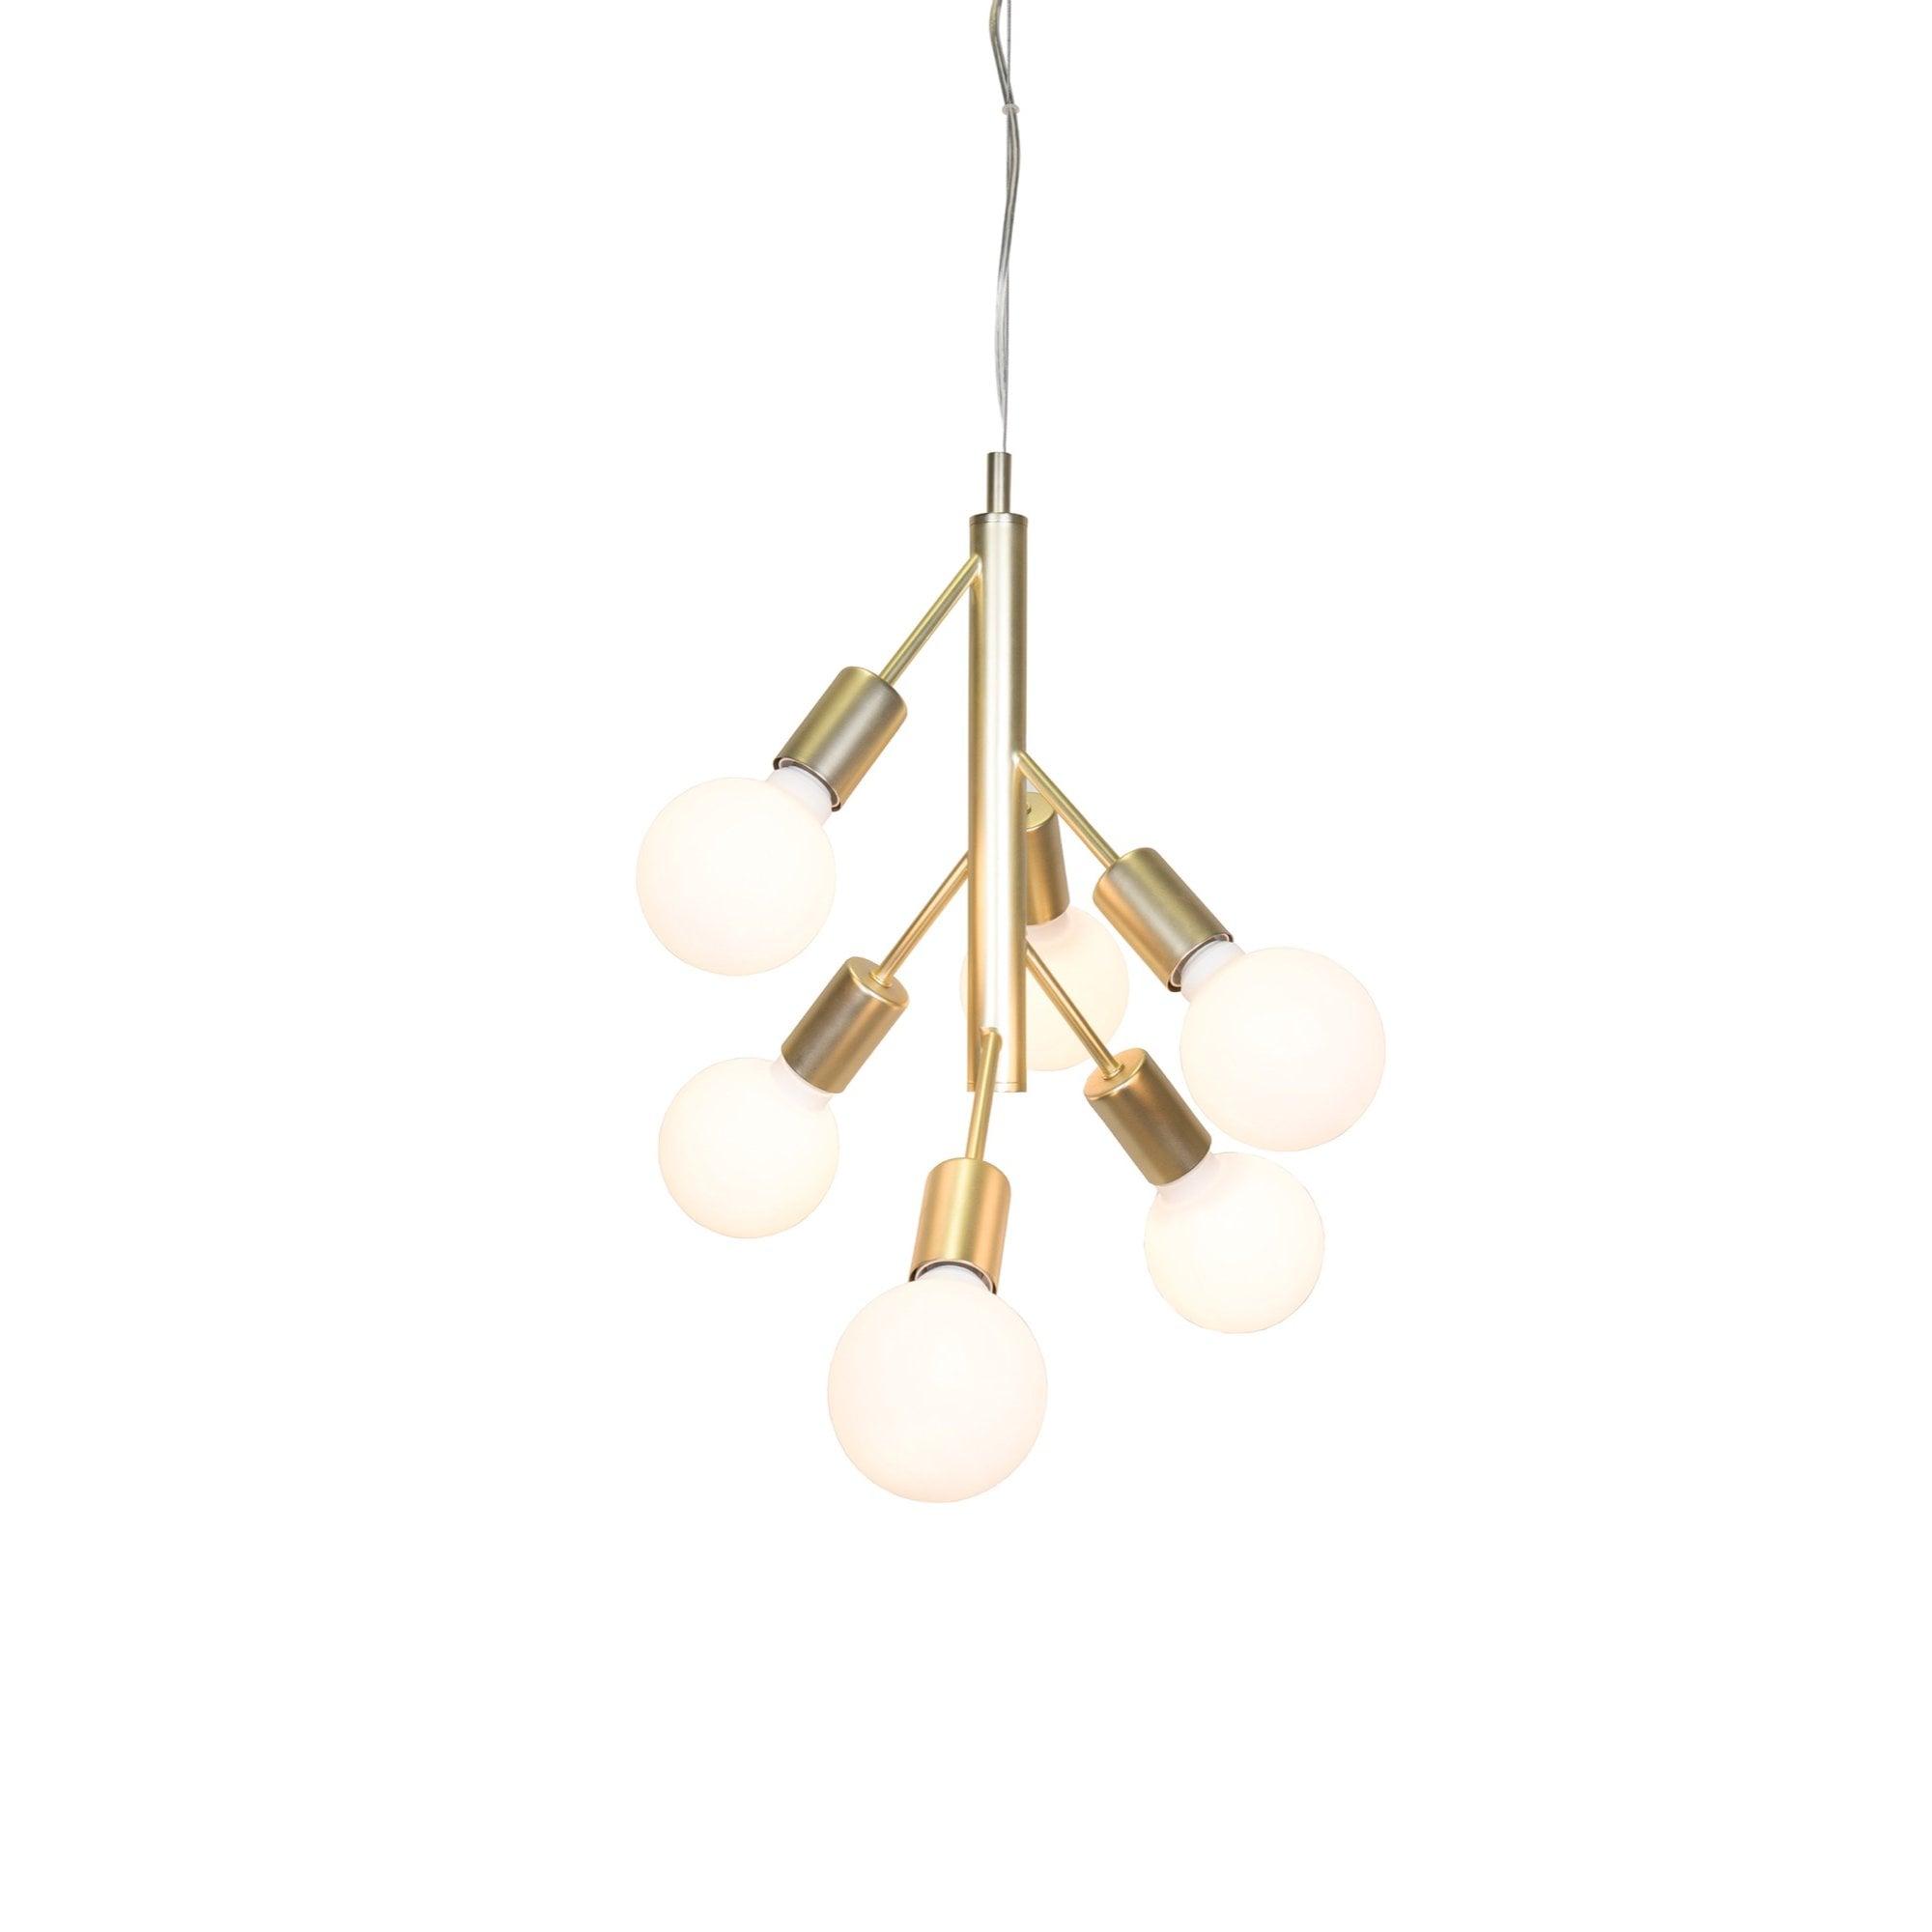 Brushed Brass 6 Light Ceiling Pendant Cluster Lighting Company